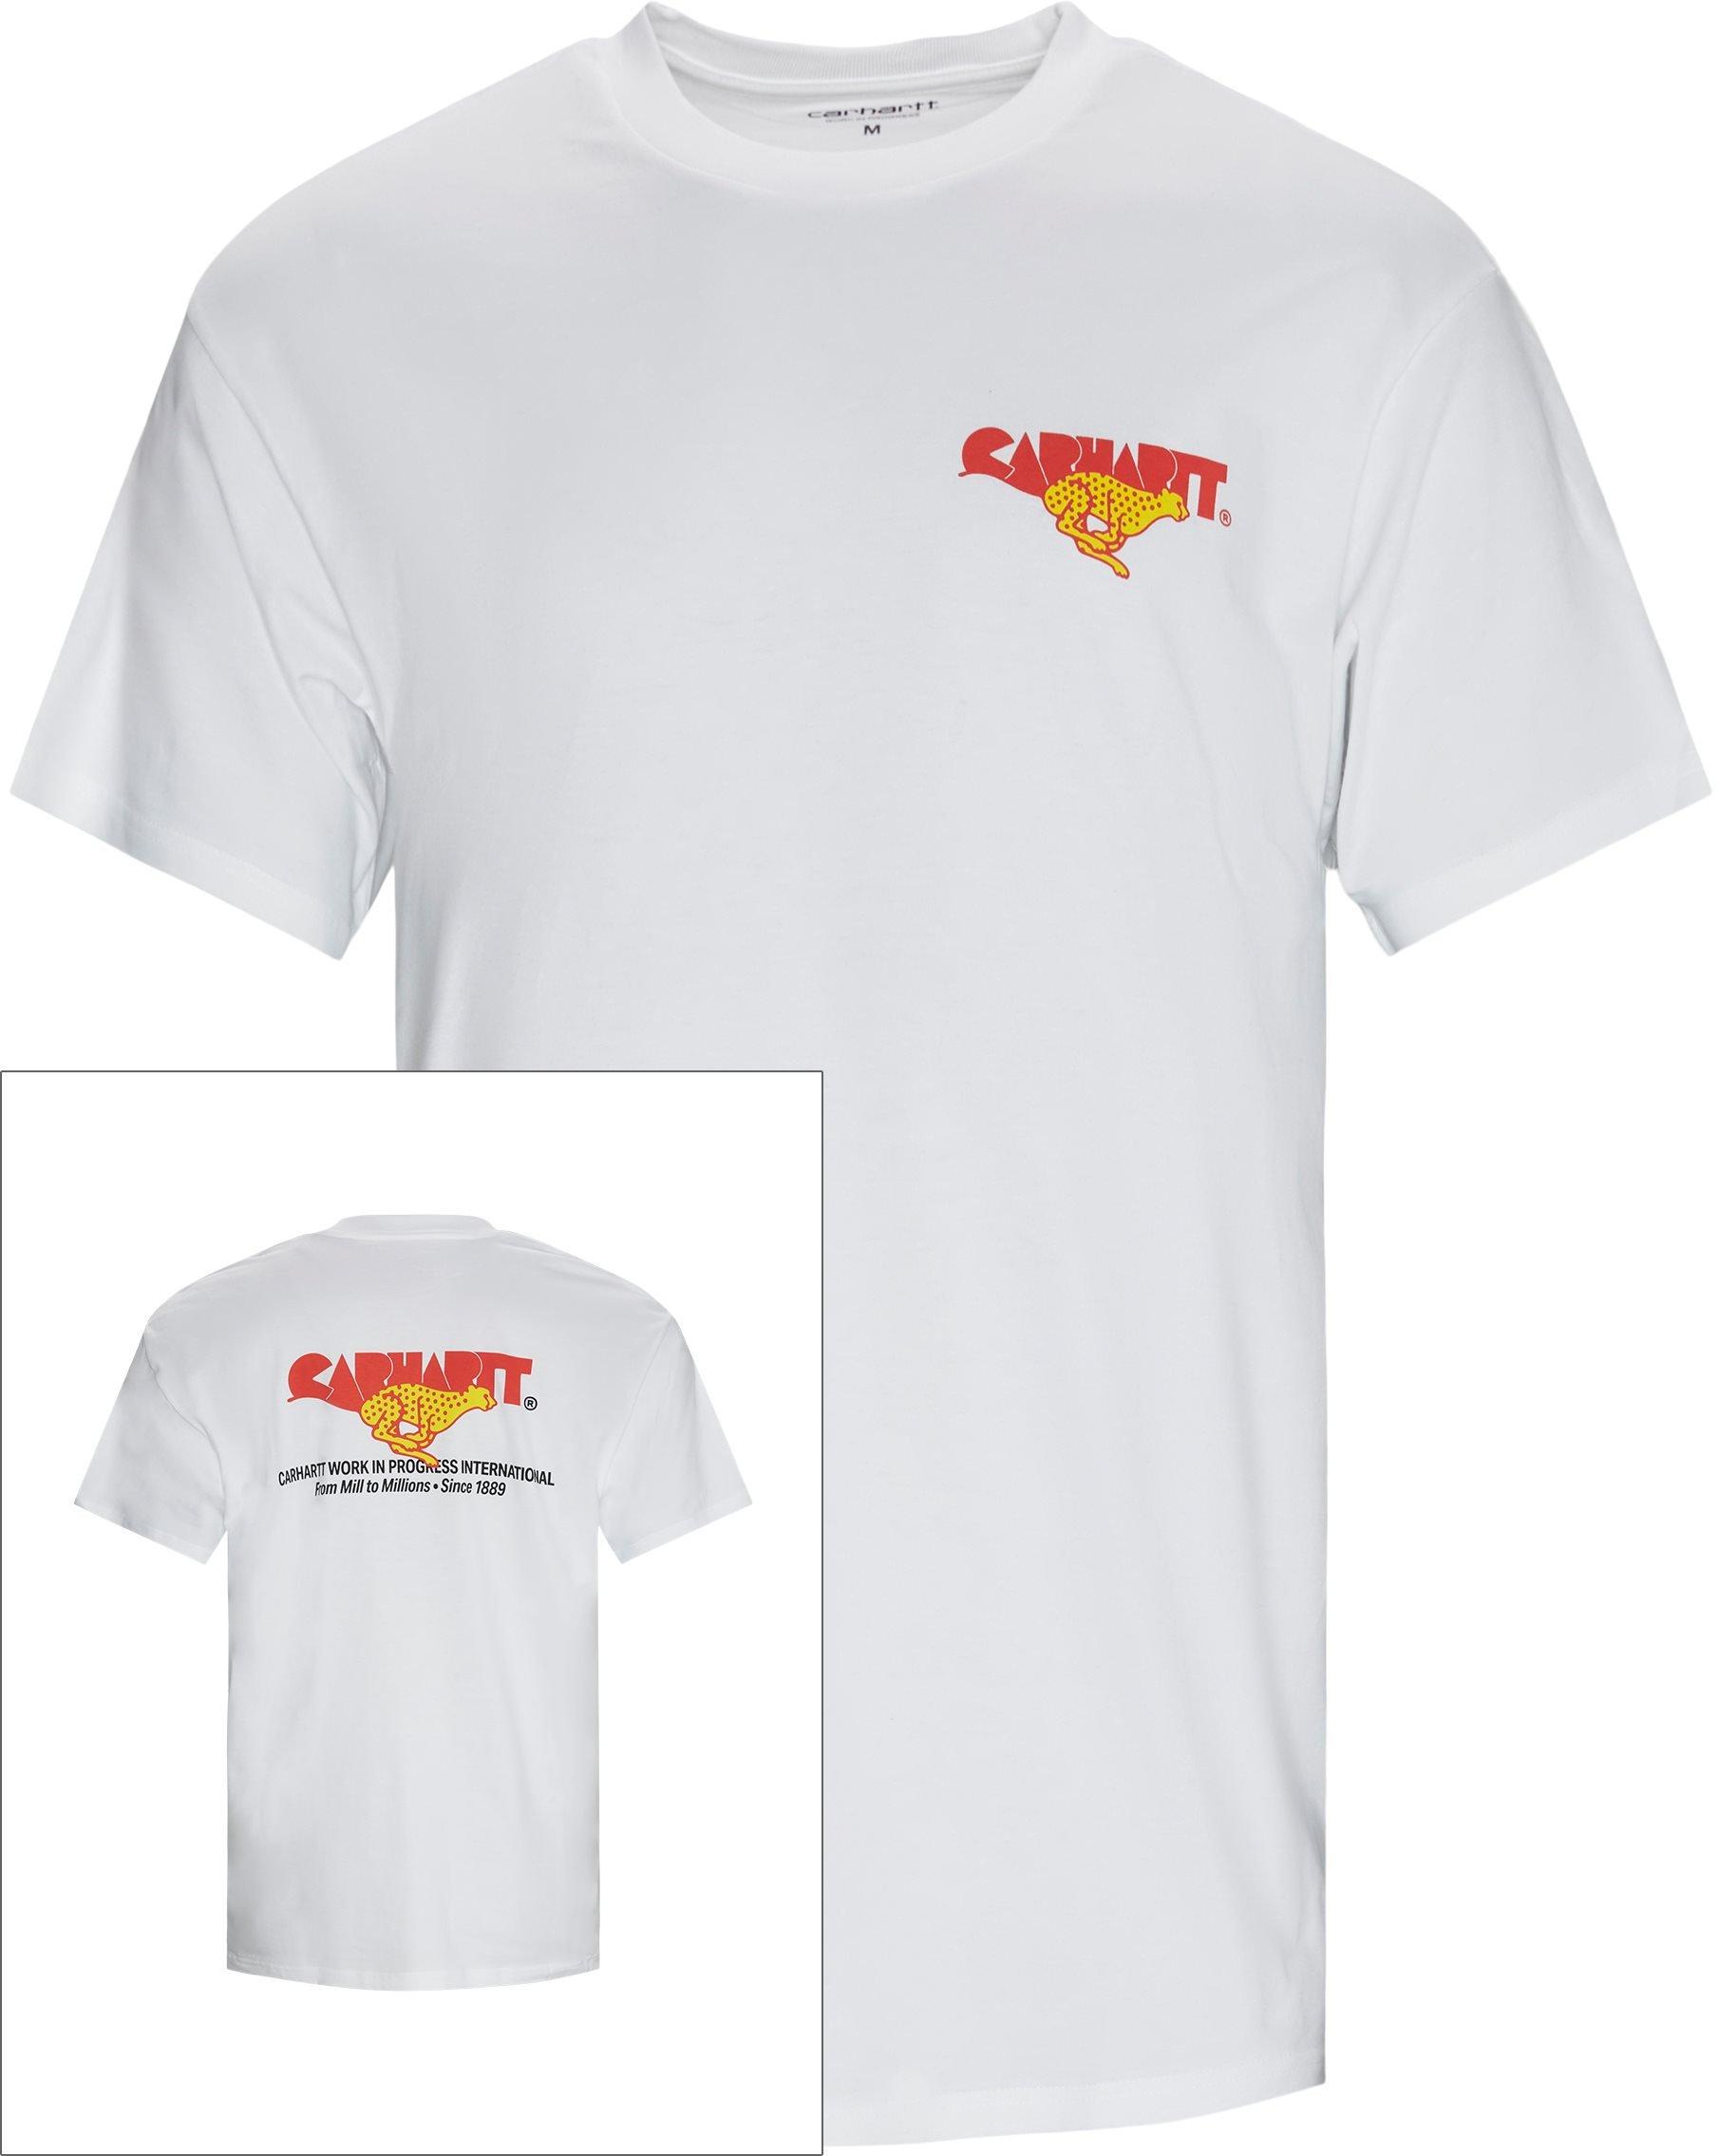 Runner Tee - T-shirts - Regular fit - White